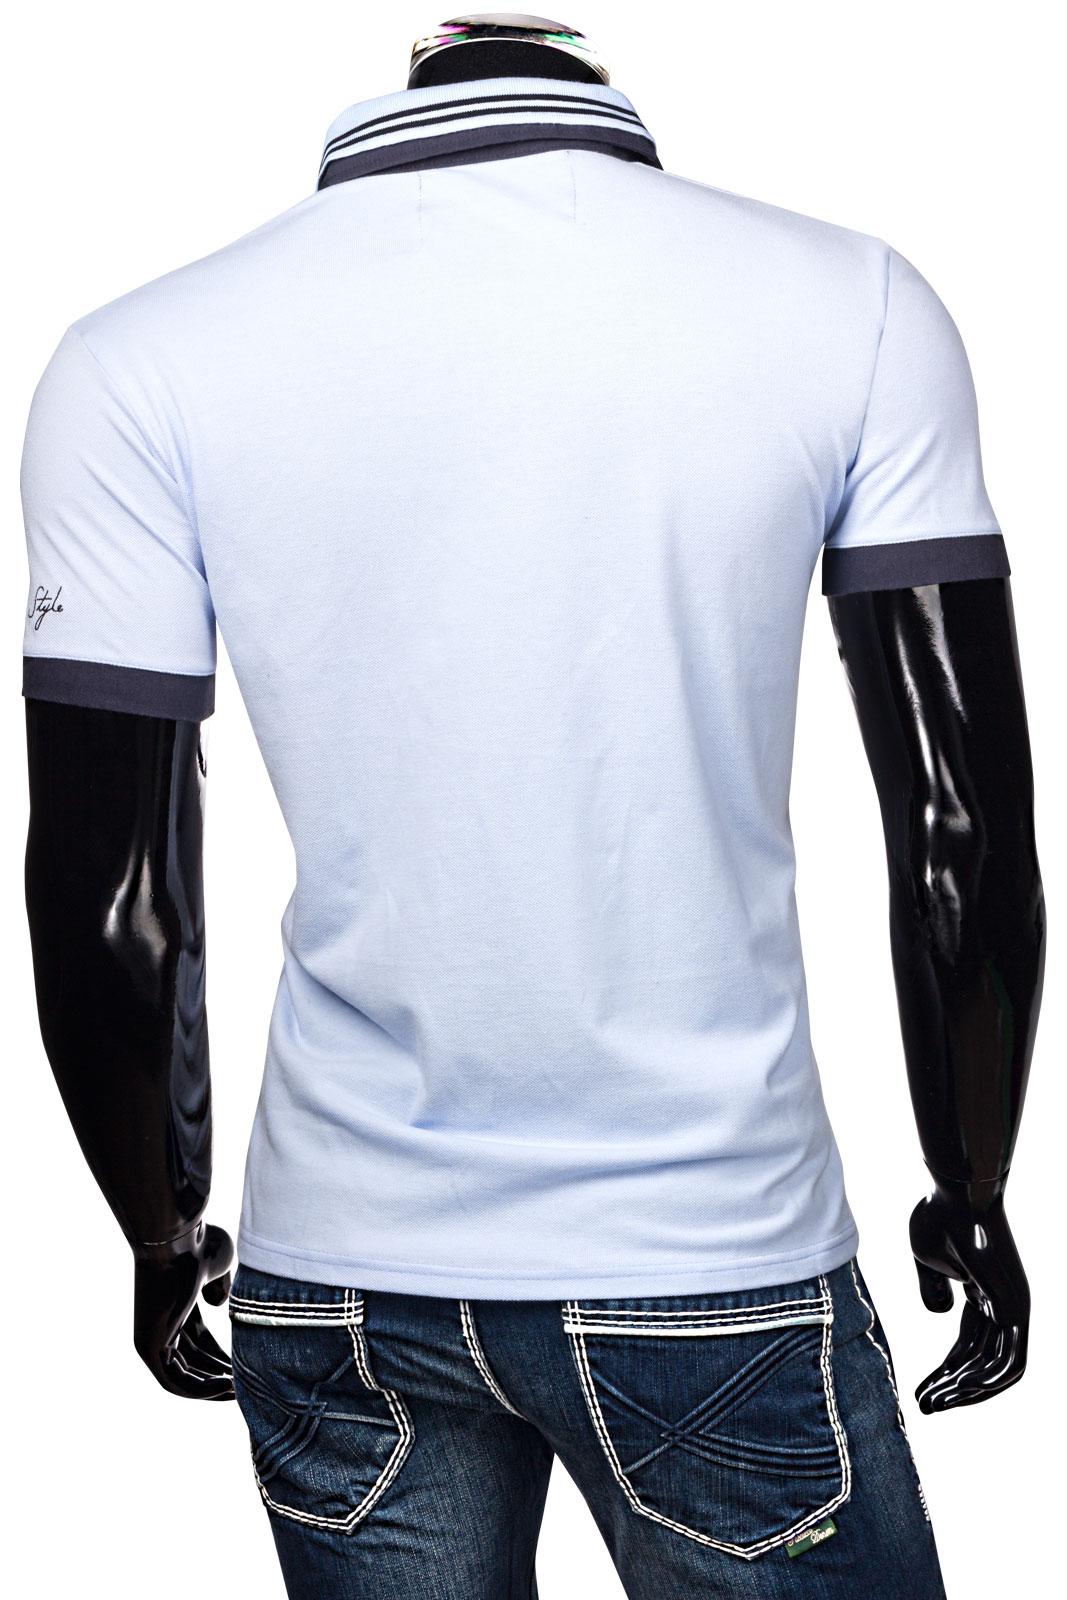 trisens herren poloshirt t shirt shirt hemd party slim fit. Black Bedroom Furniture Sets. Home Design Ideas